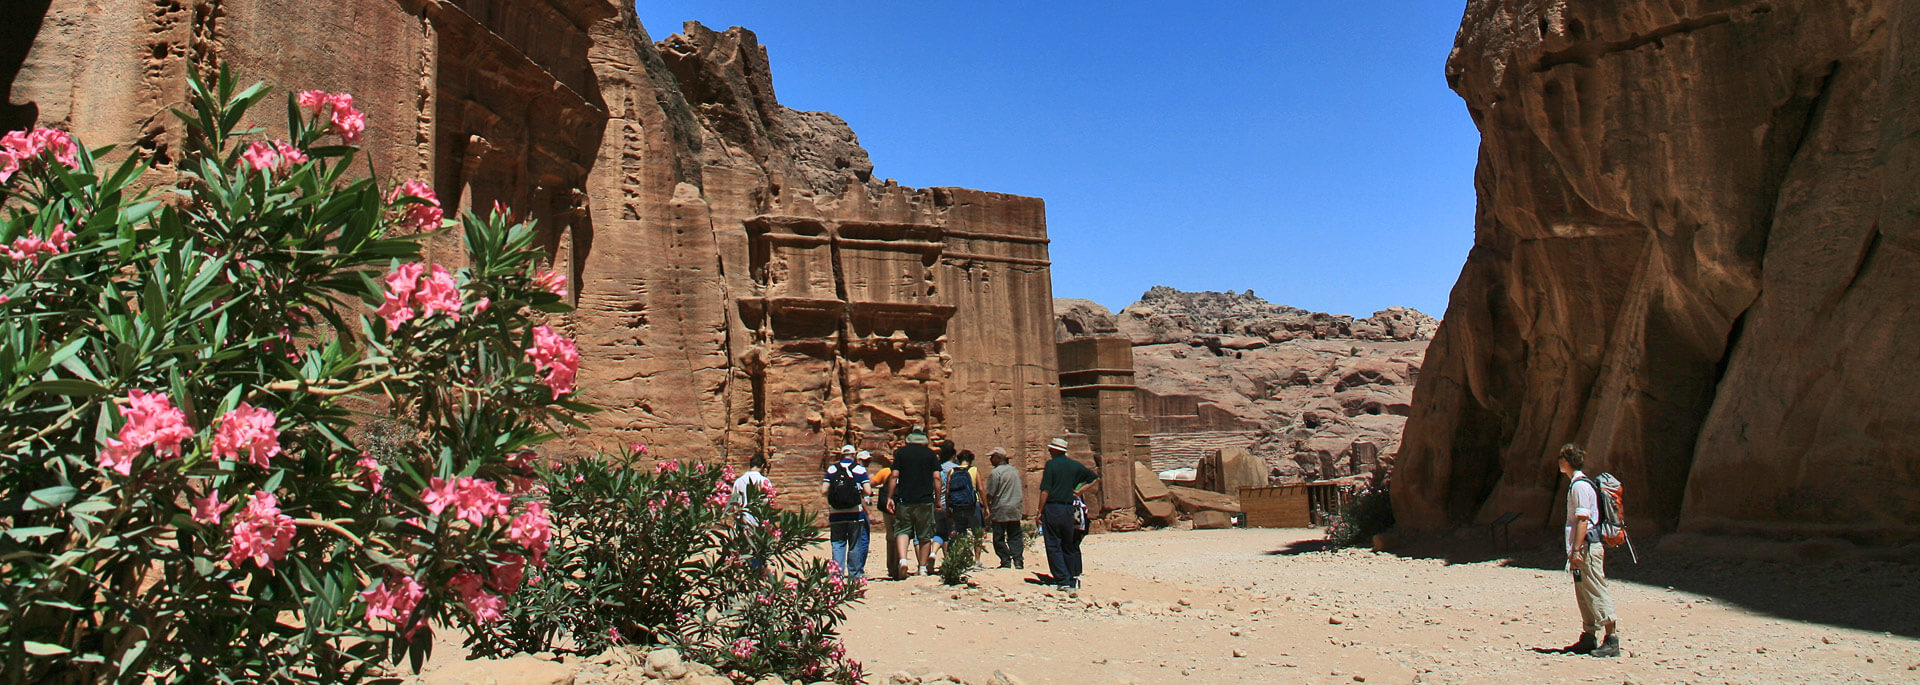 Fotos: Jordaniens Felsenstadt Petra bei Tag & Nacht